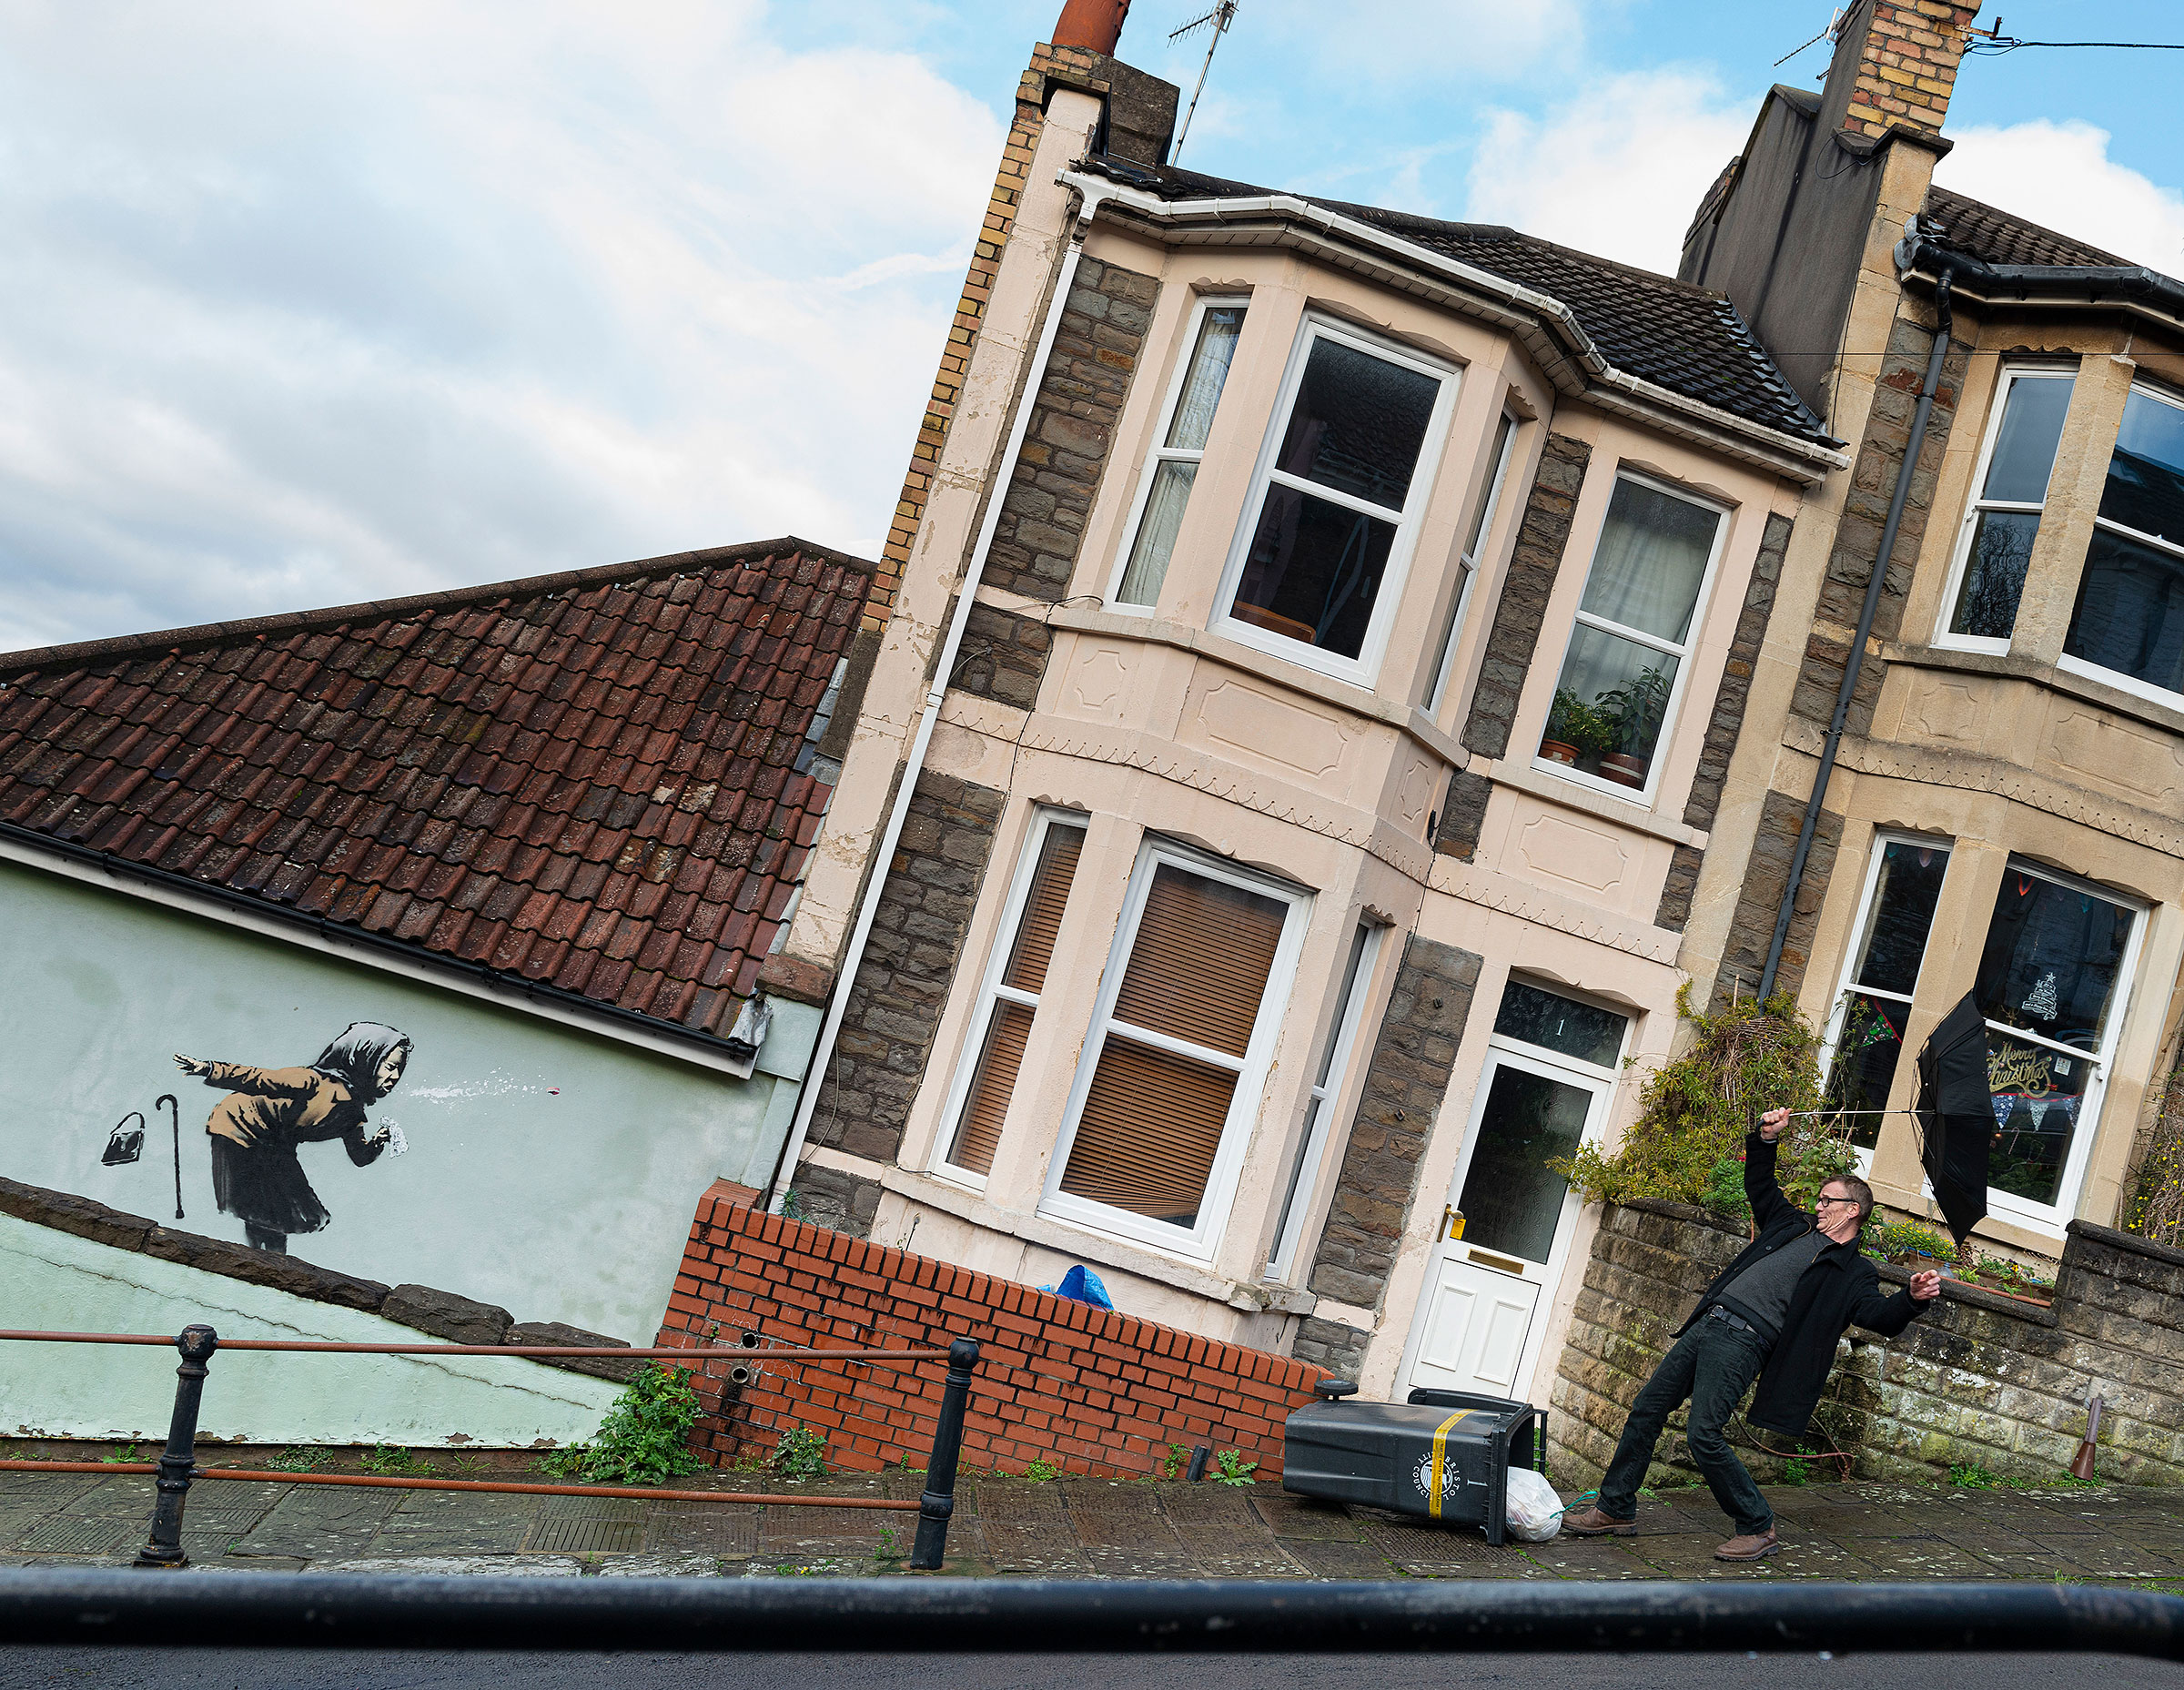 UK homeowner delays sale of home after Banksy mural appears